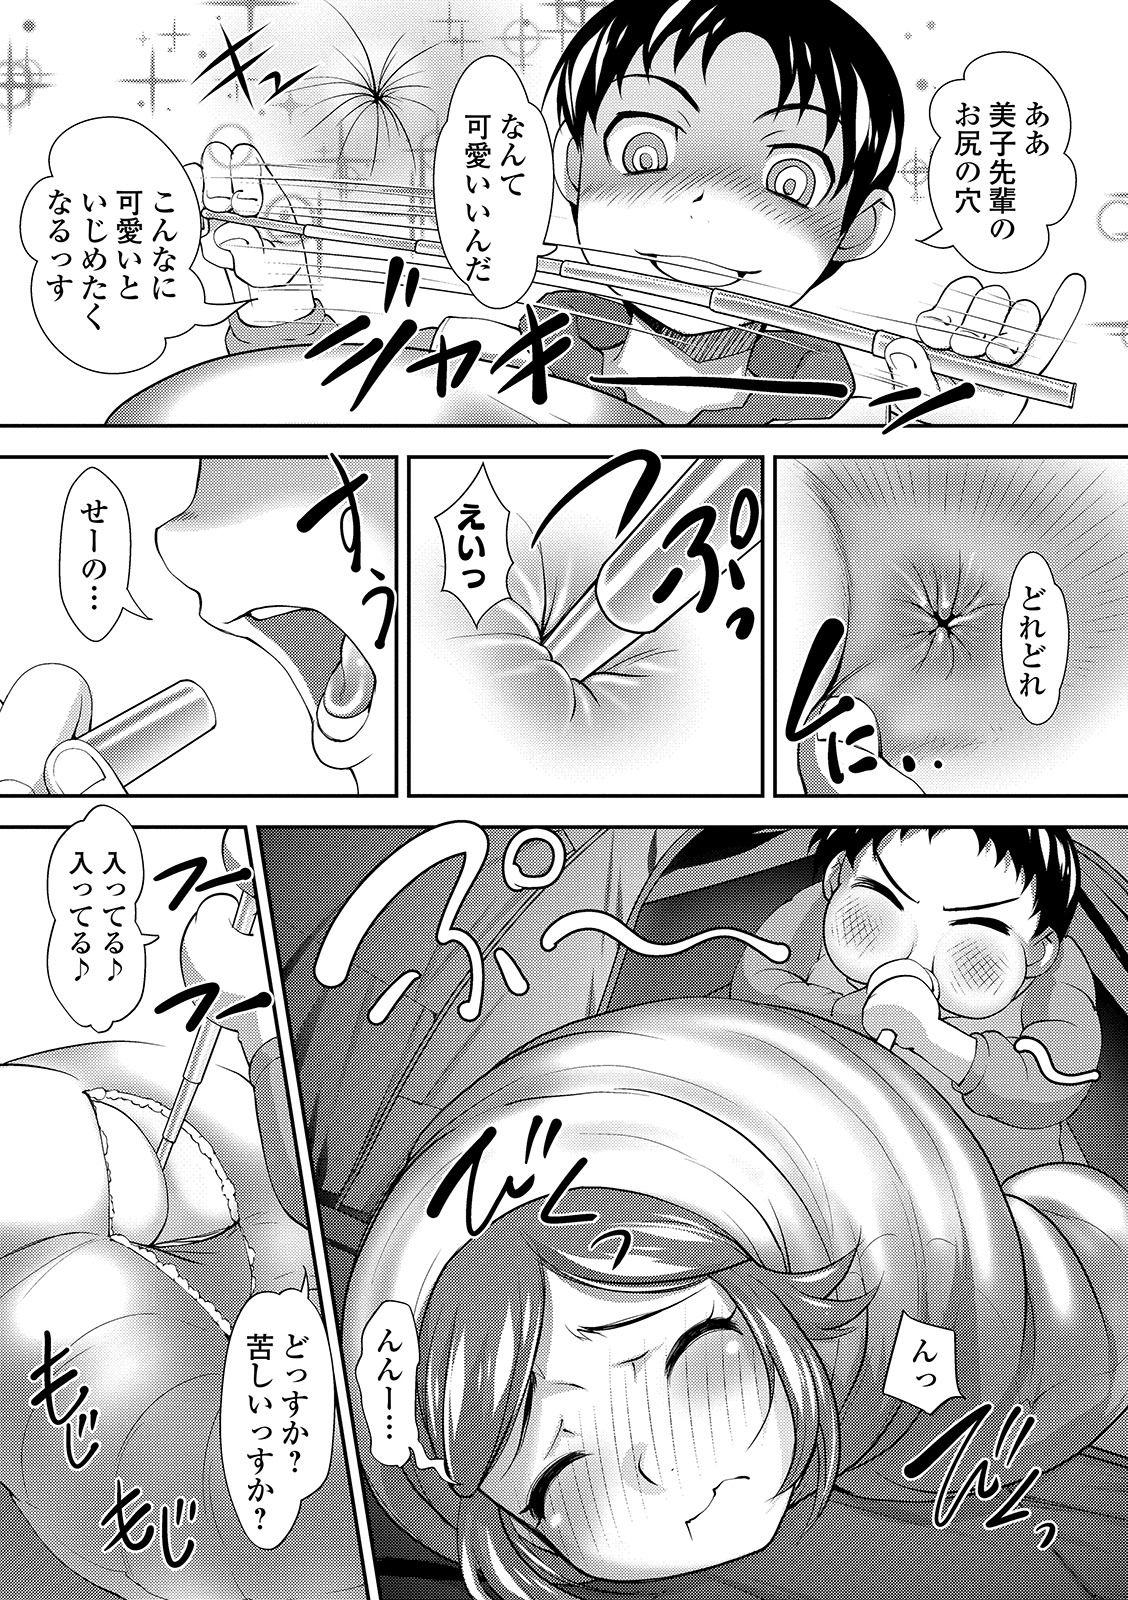 COMIC Shigekiteki SQUIRT!! Vol. 15 163